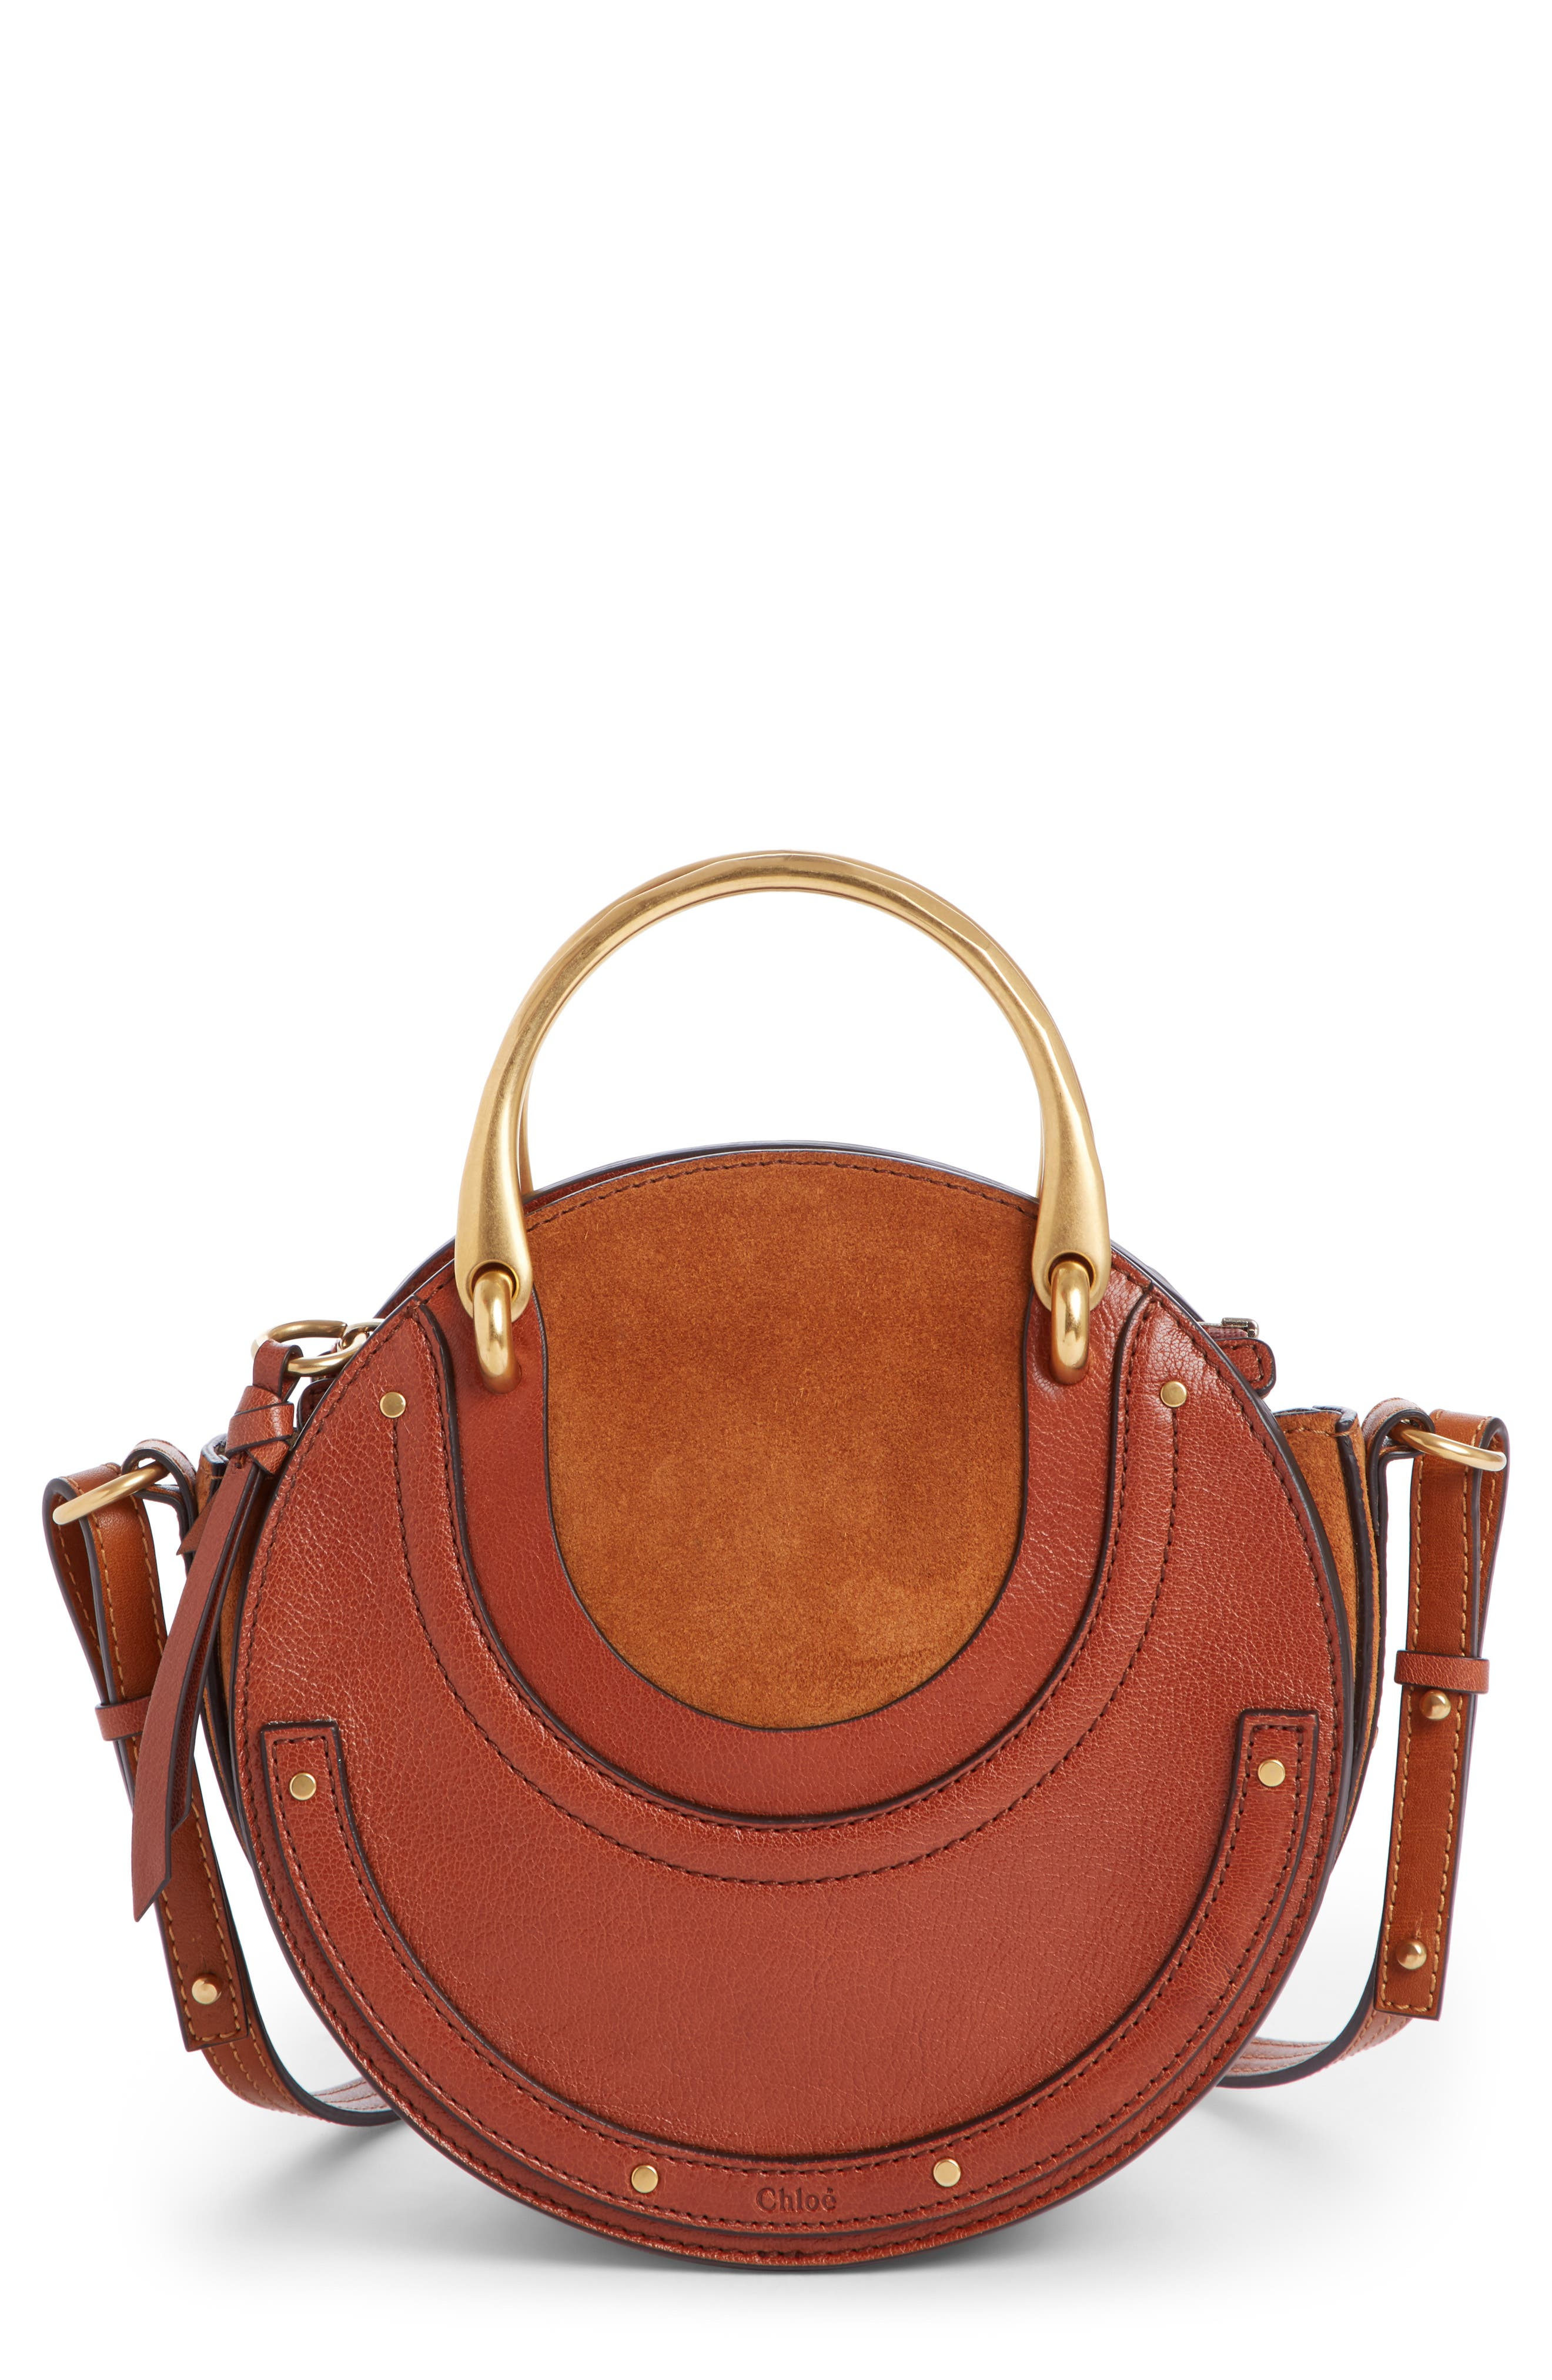 Pixie Leather Crossbody Bag,                             Main thumbnail 1, color,                             Saffron Red